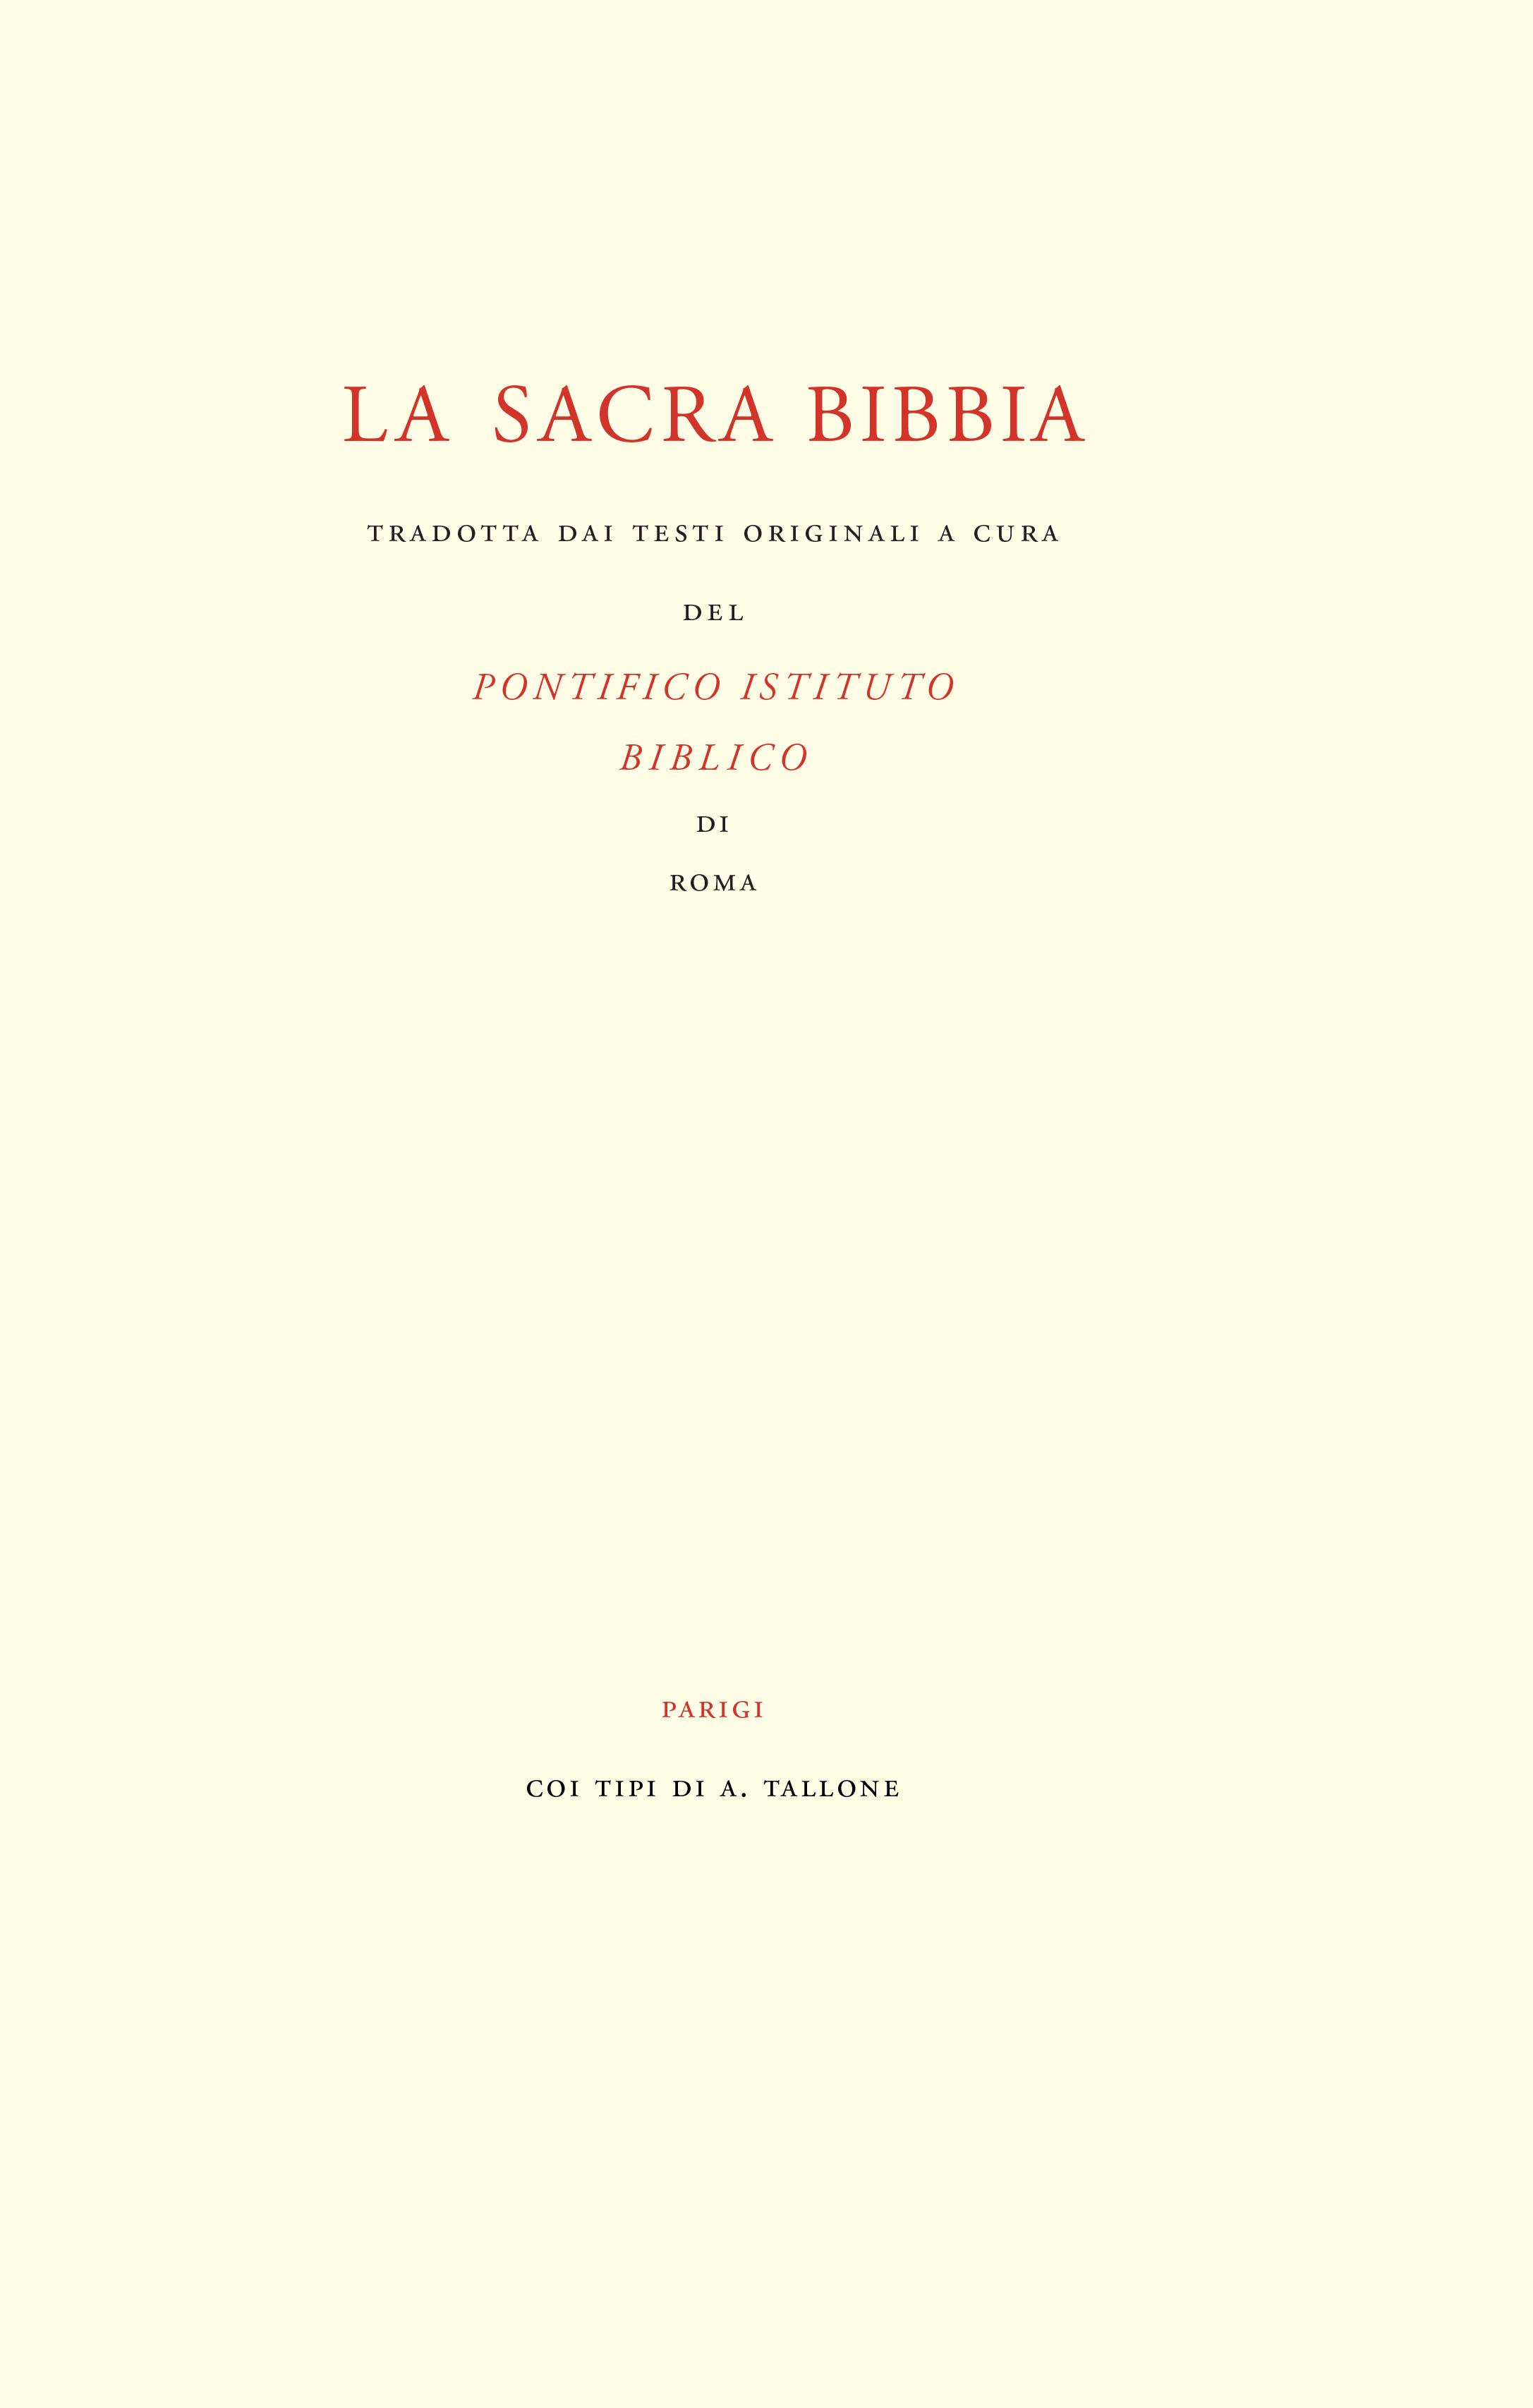 ALBERTO TALLONE  Paris, France, 1955  Garamond  18.4 X 28.9 cm  Letterpress  Liber Librorum Collection